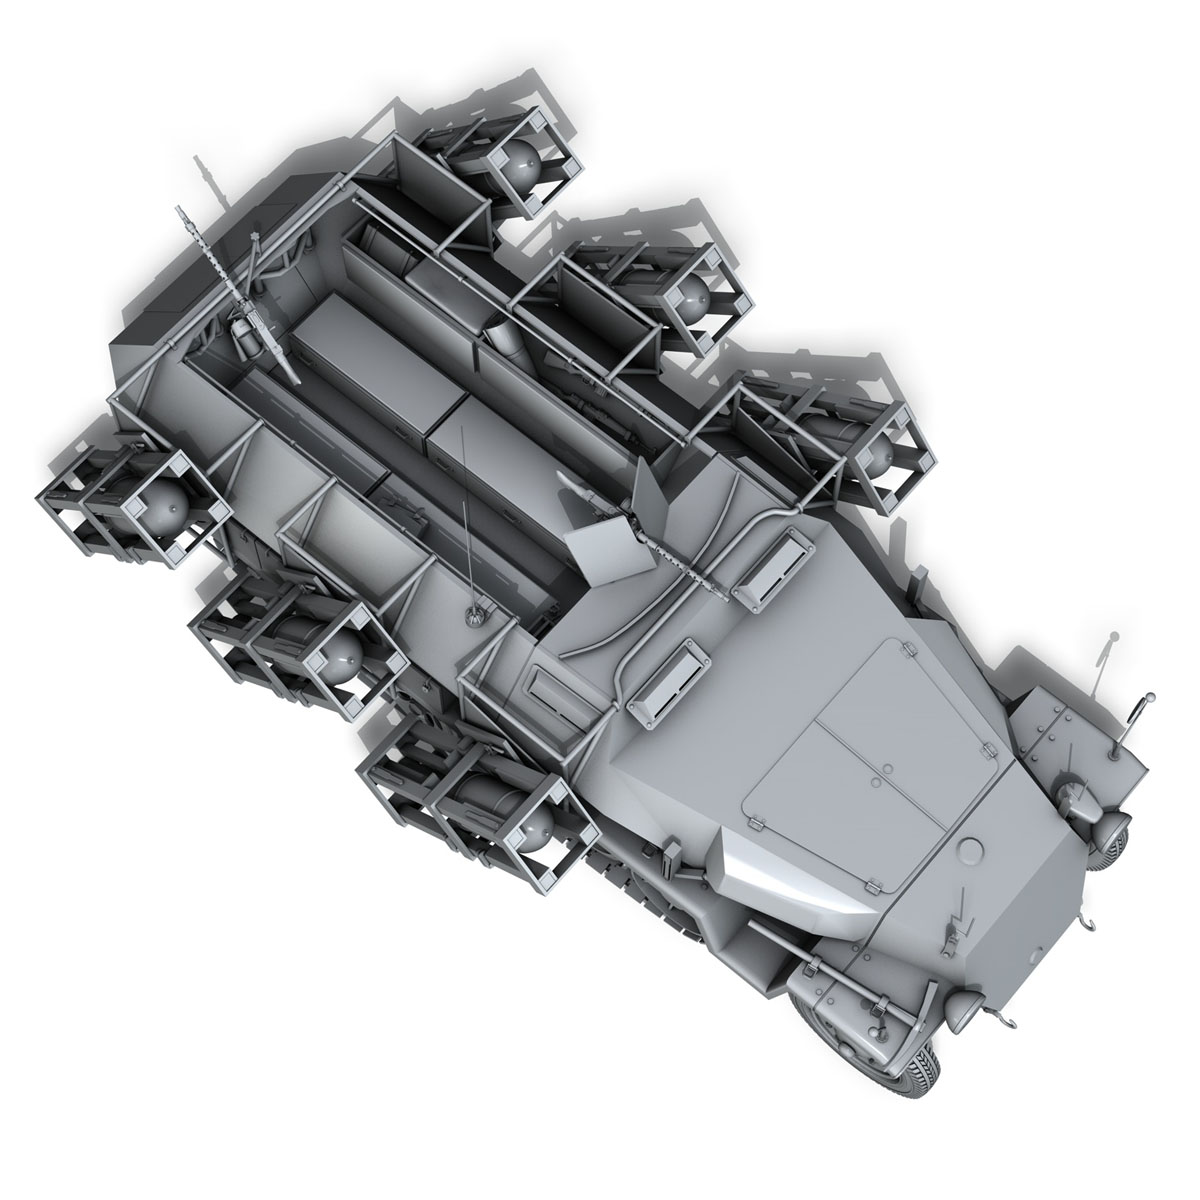 sd.kfz 251/1 ausf.c – walking stuka 3d model 3ds fbx c4d lwo obj 201243